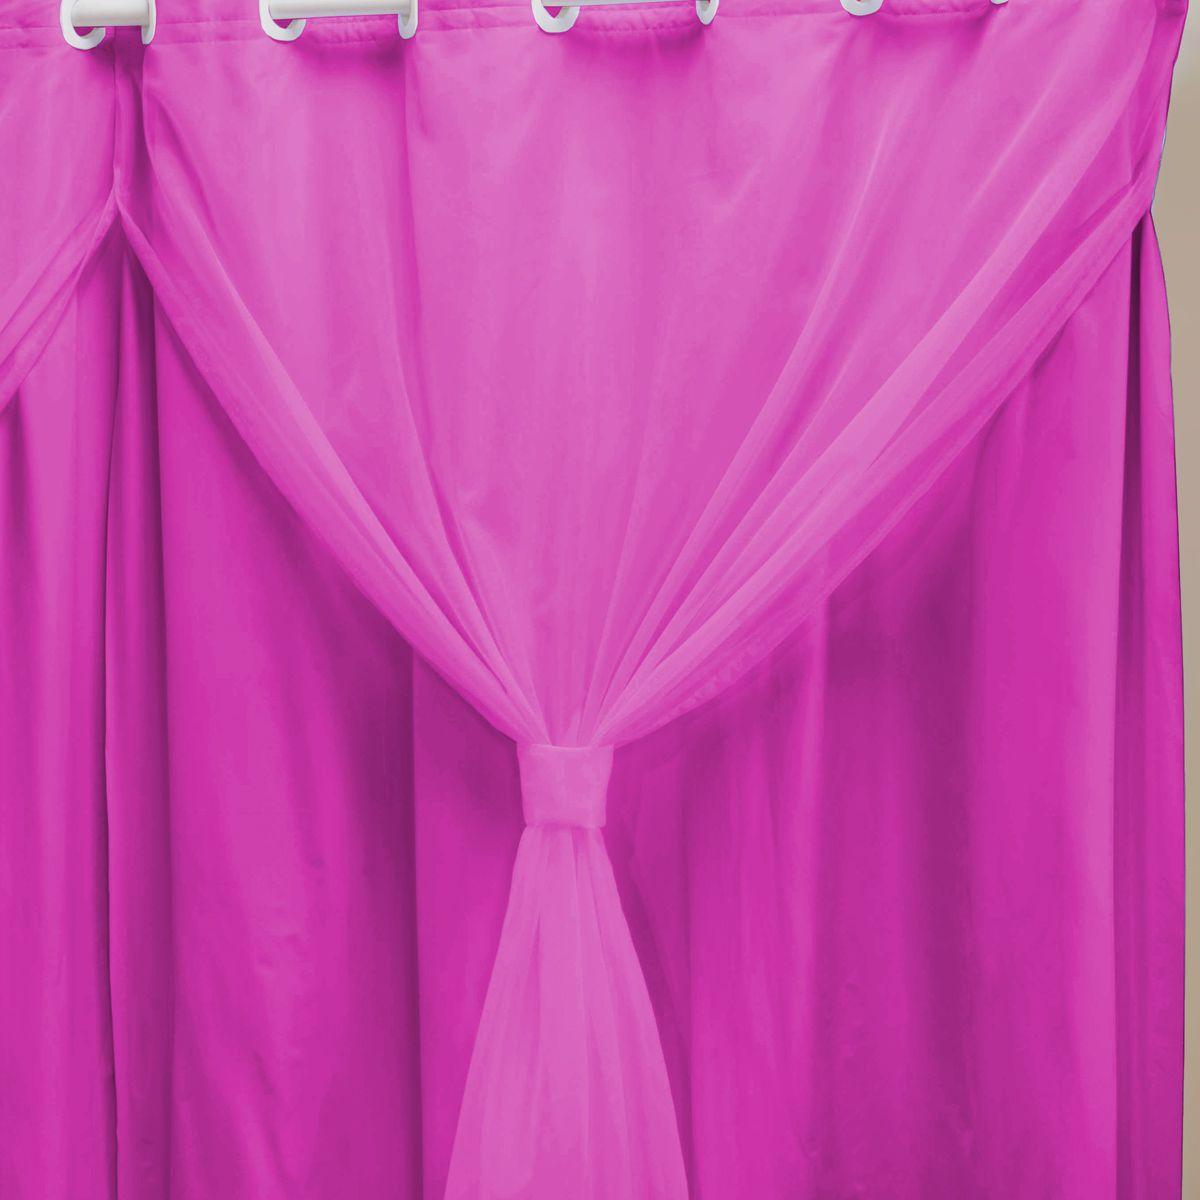 Cortina Blackout PVC c/ Voil Pink Corta Luz 2,00m X 1,40m